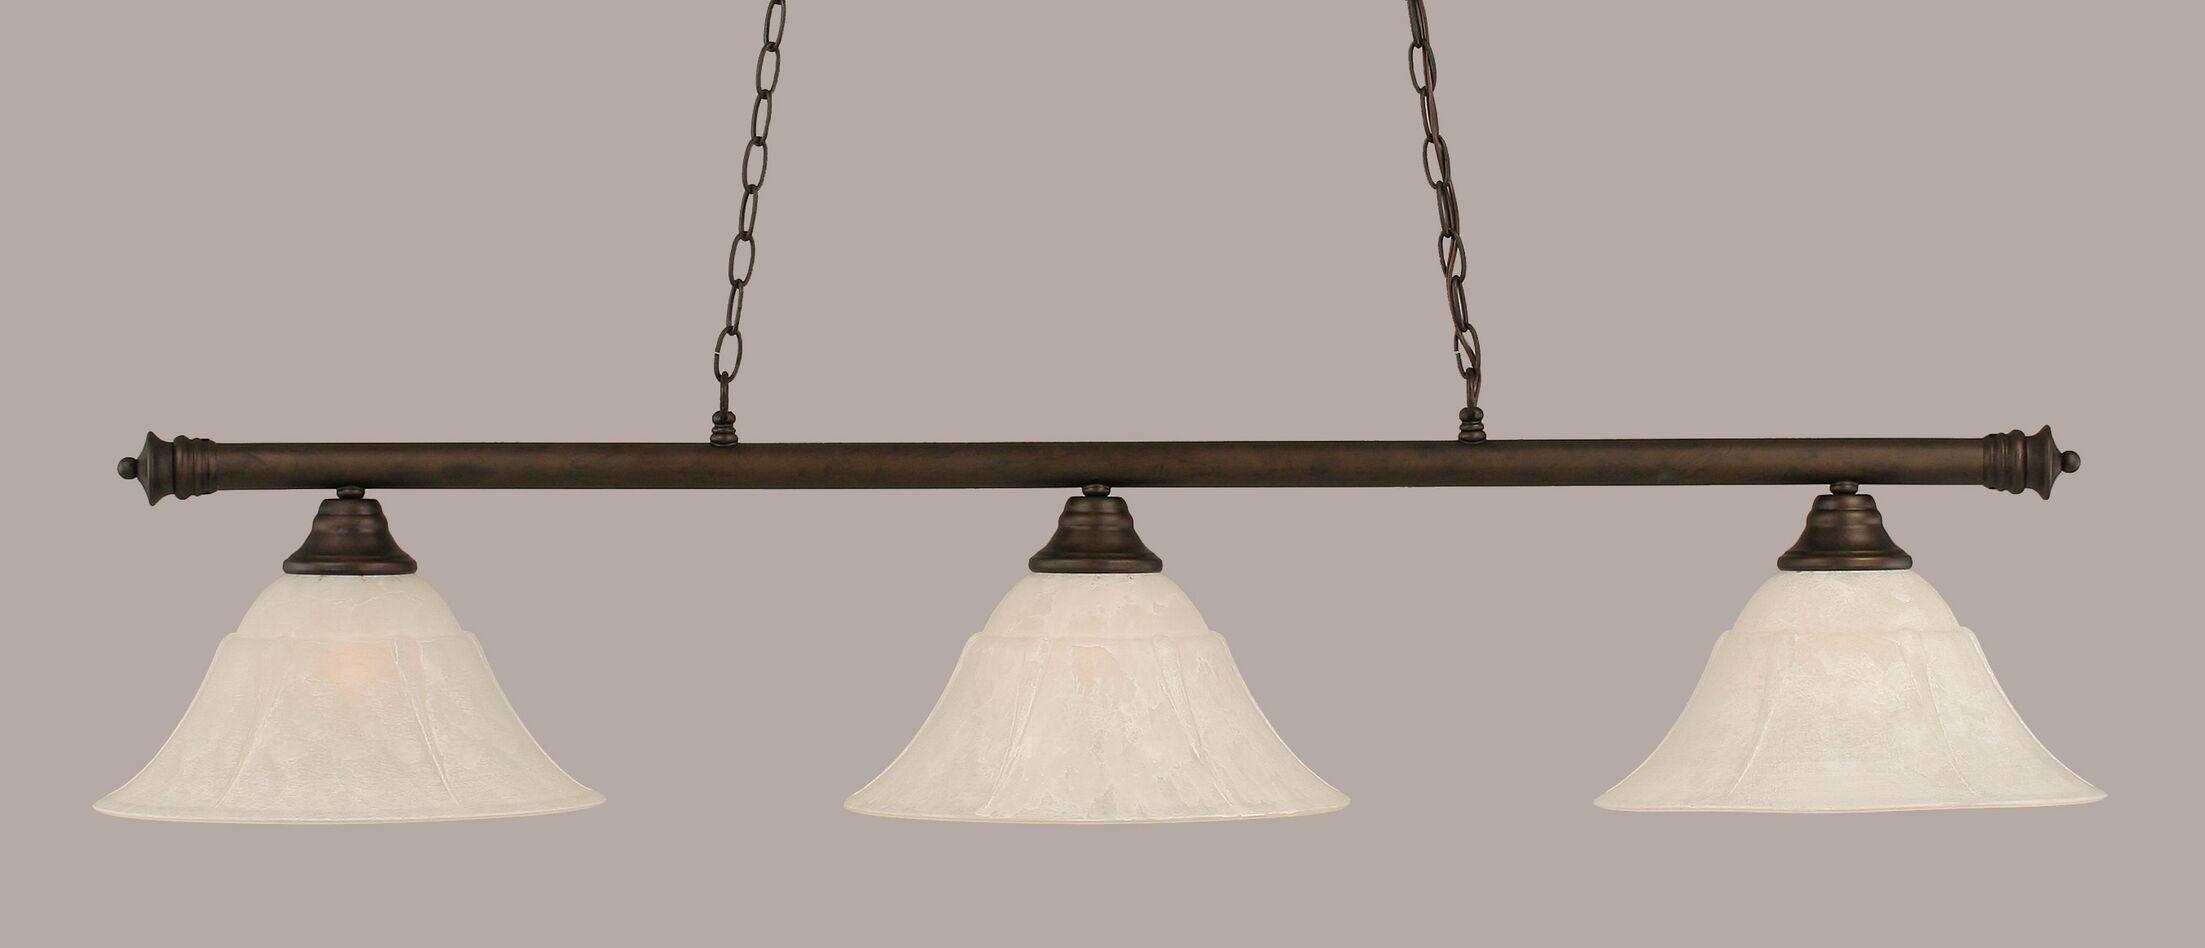 Mendez 3-Light Billiard Light Finish: Bronze, Shade Color: White, Size: 12